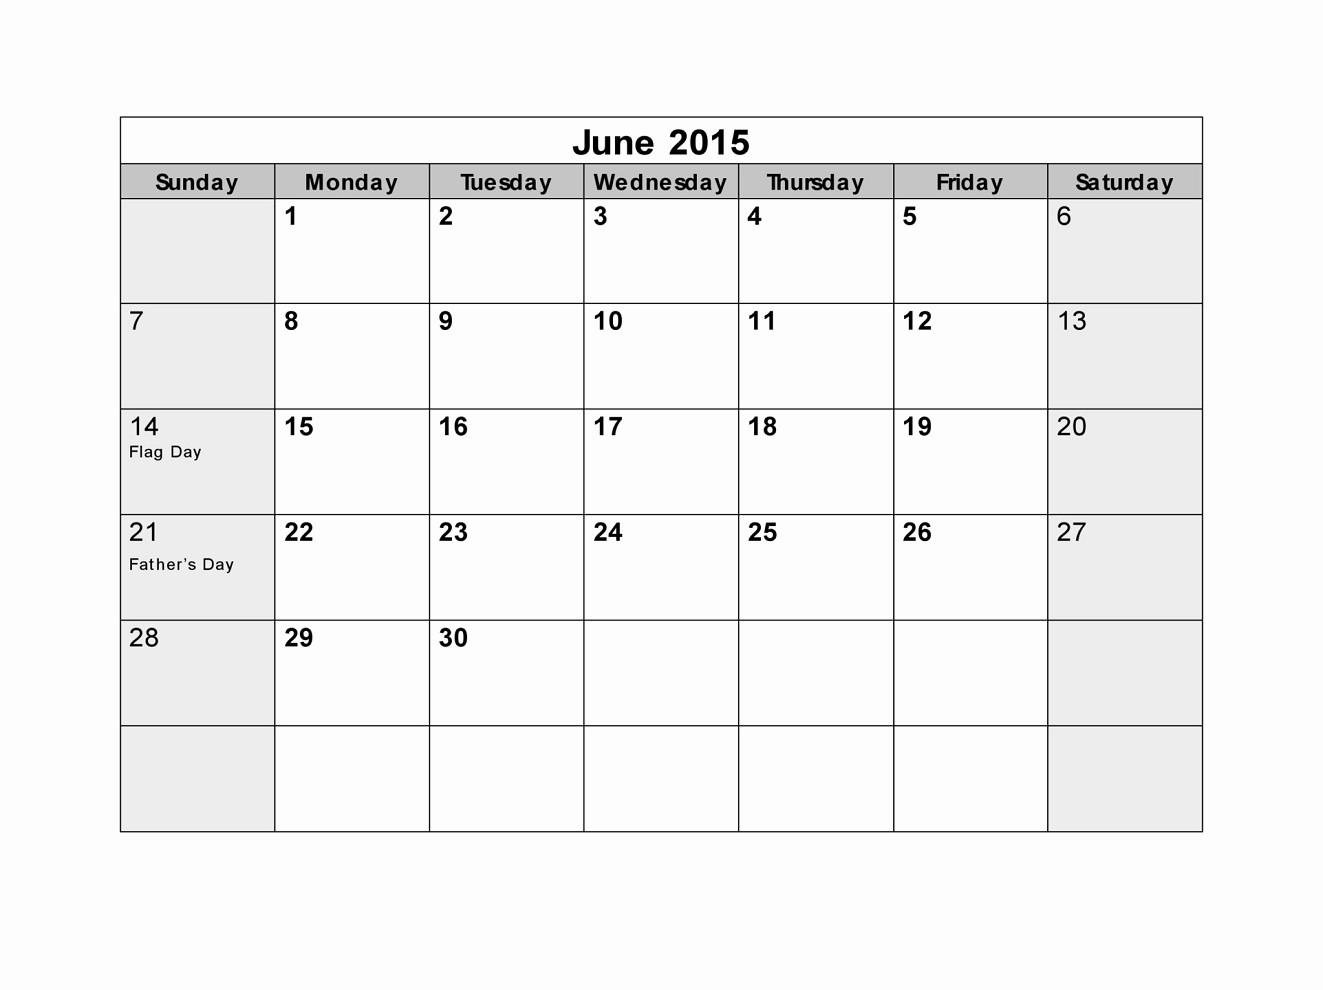 Printable Blank Monthly Calendar Template Best Of Printable Blank Monthly Calendar 2015 Part 1